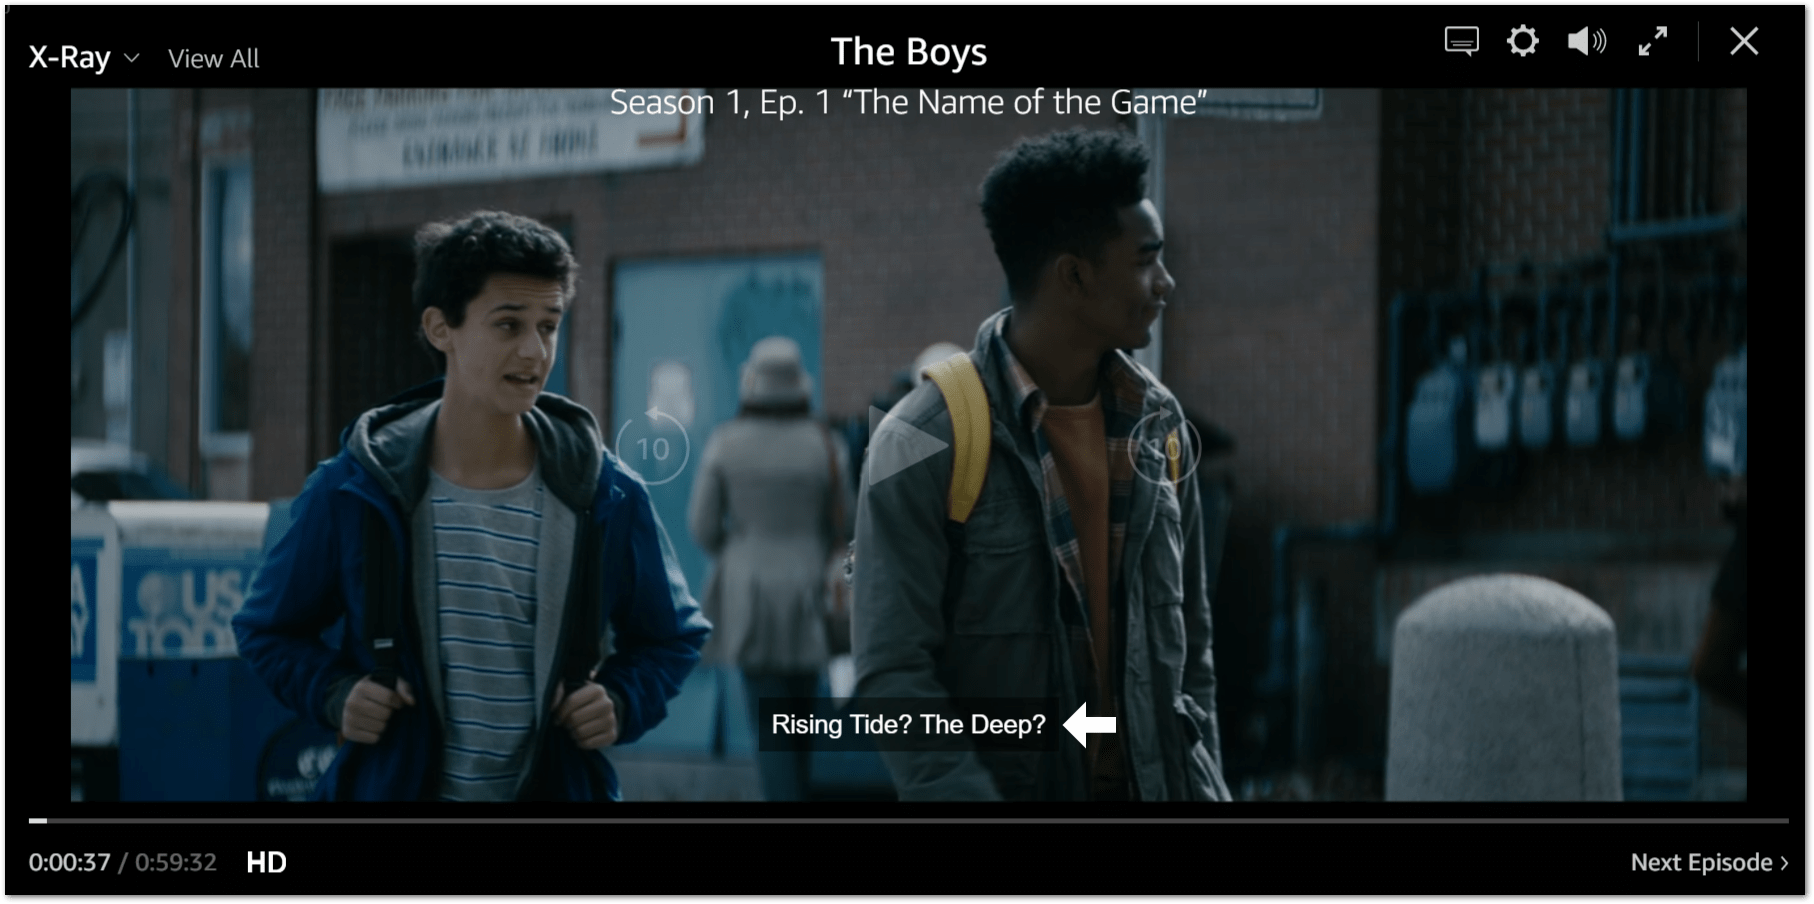 Amazon Prime Video subtitles too small